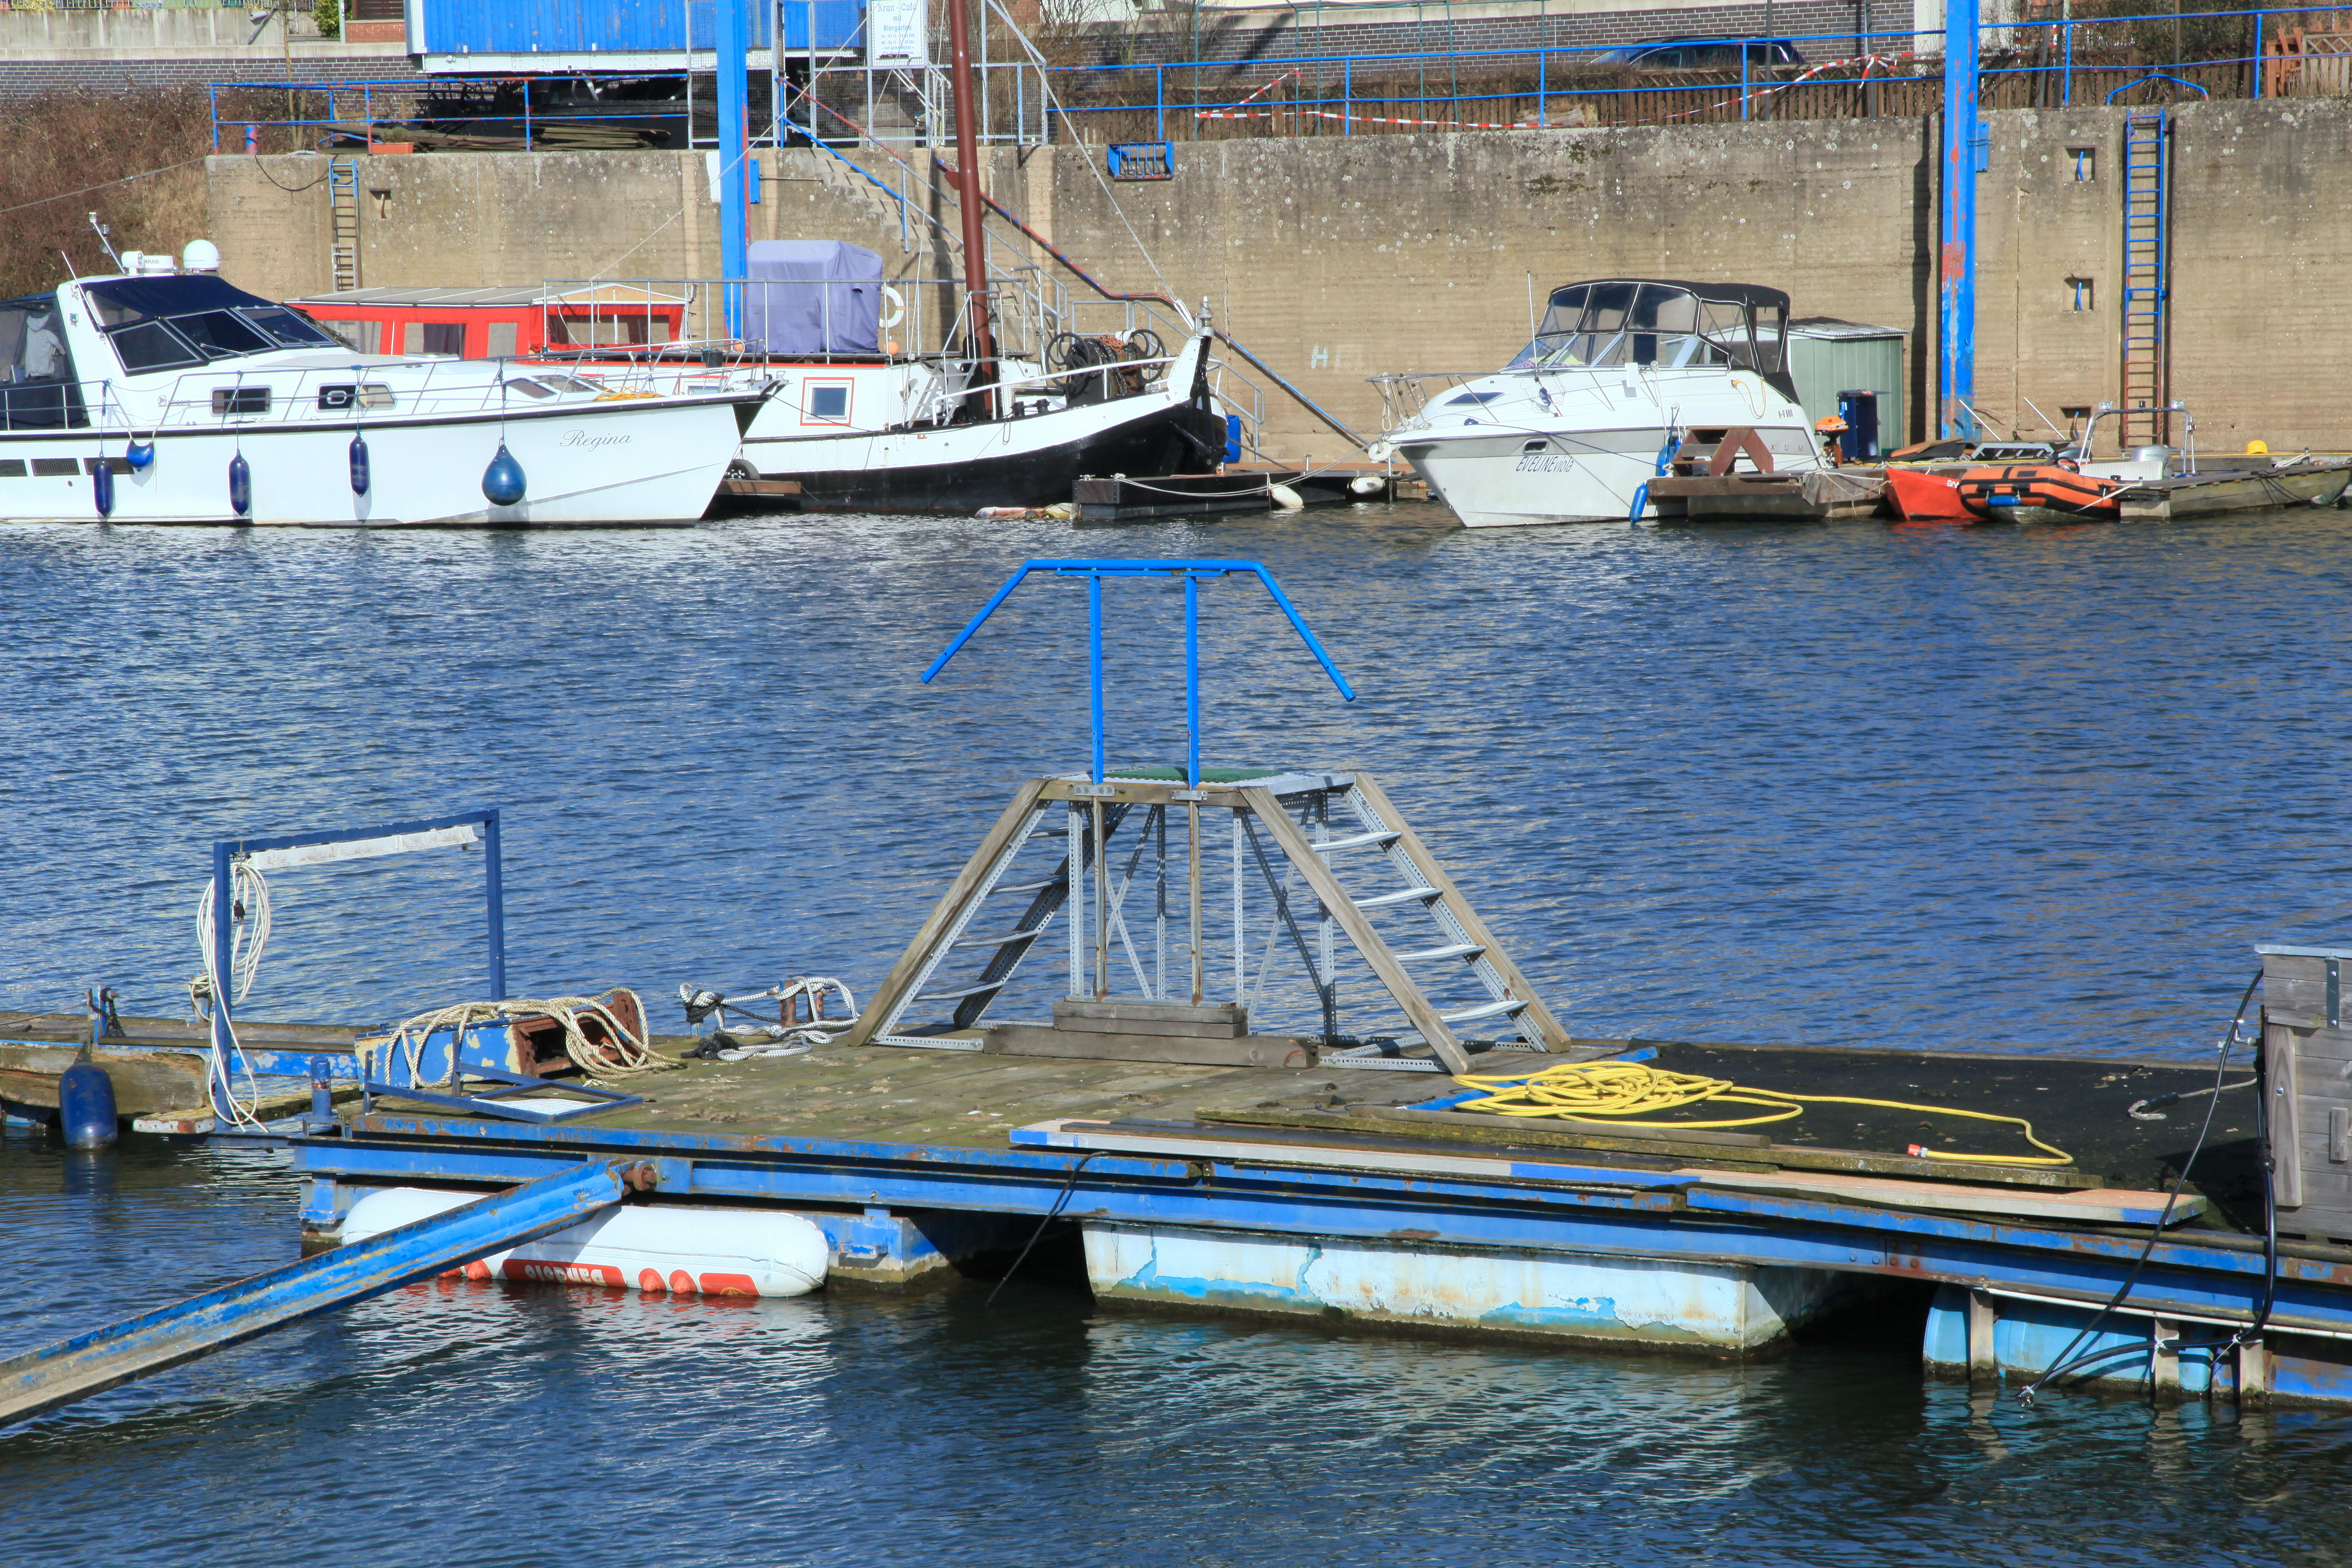 File Leverkusen Rheinstrasse Hafen Hitdorf Hafenhalbinsel 04 Ies Jpg Wikimedia Commons